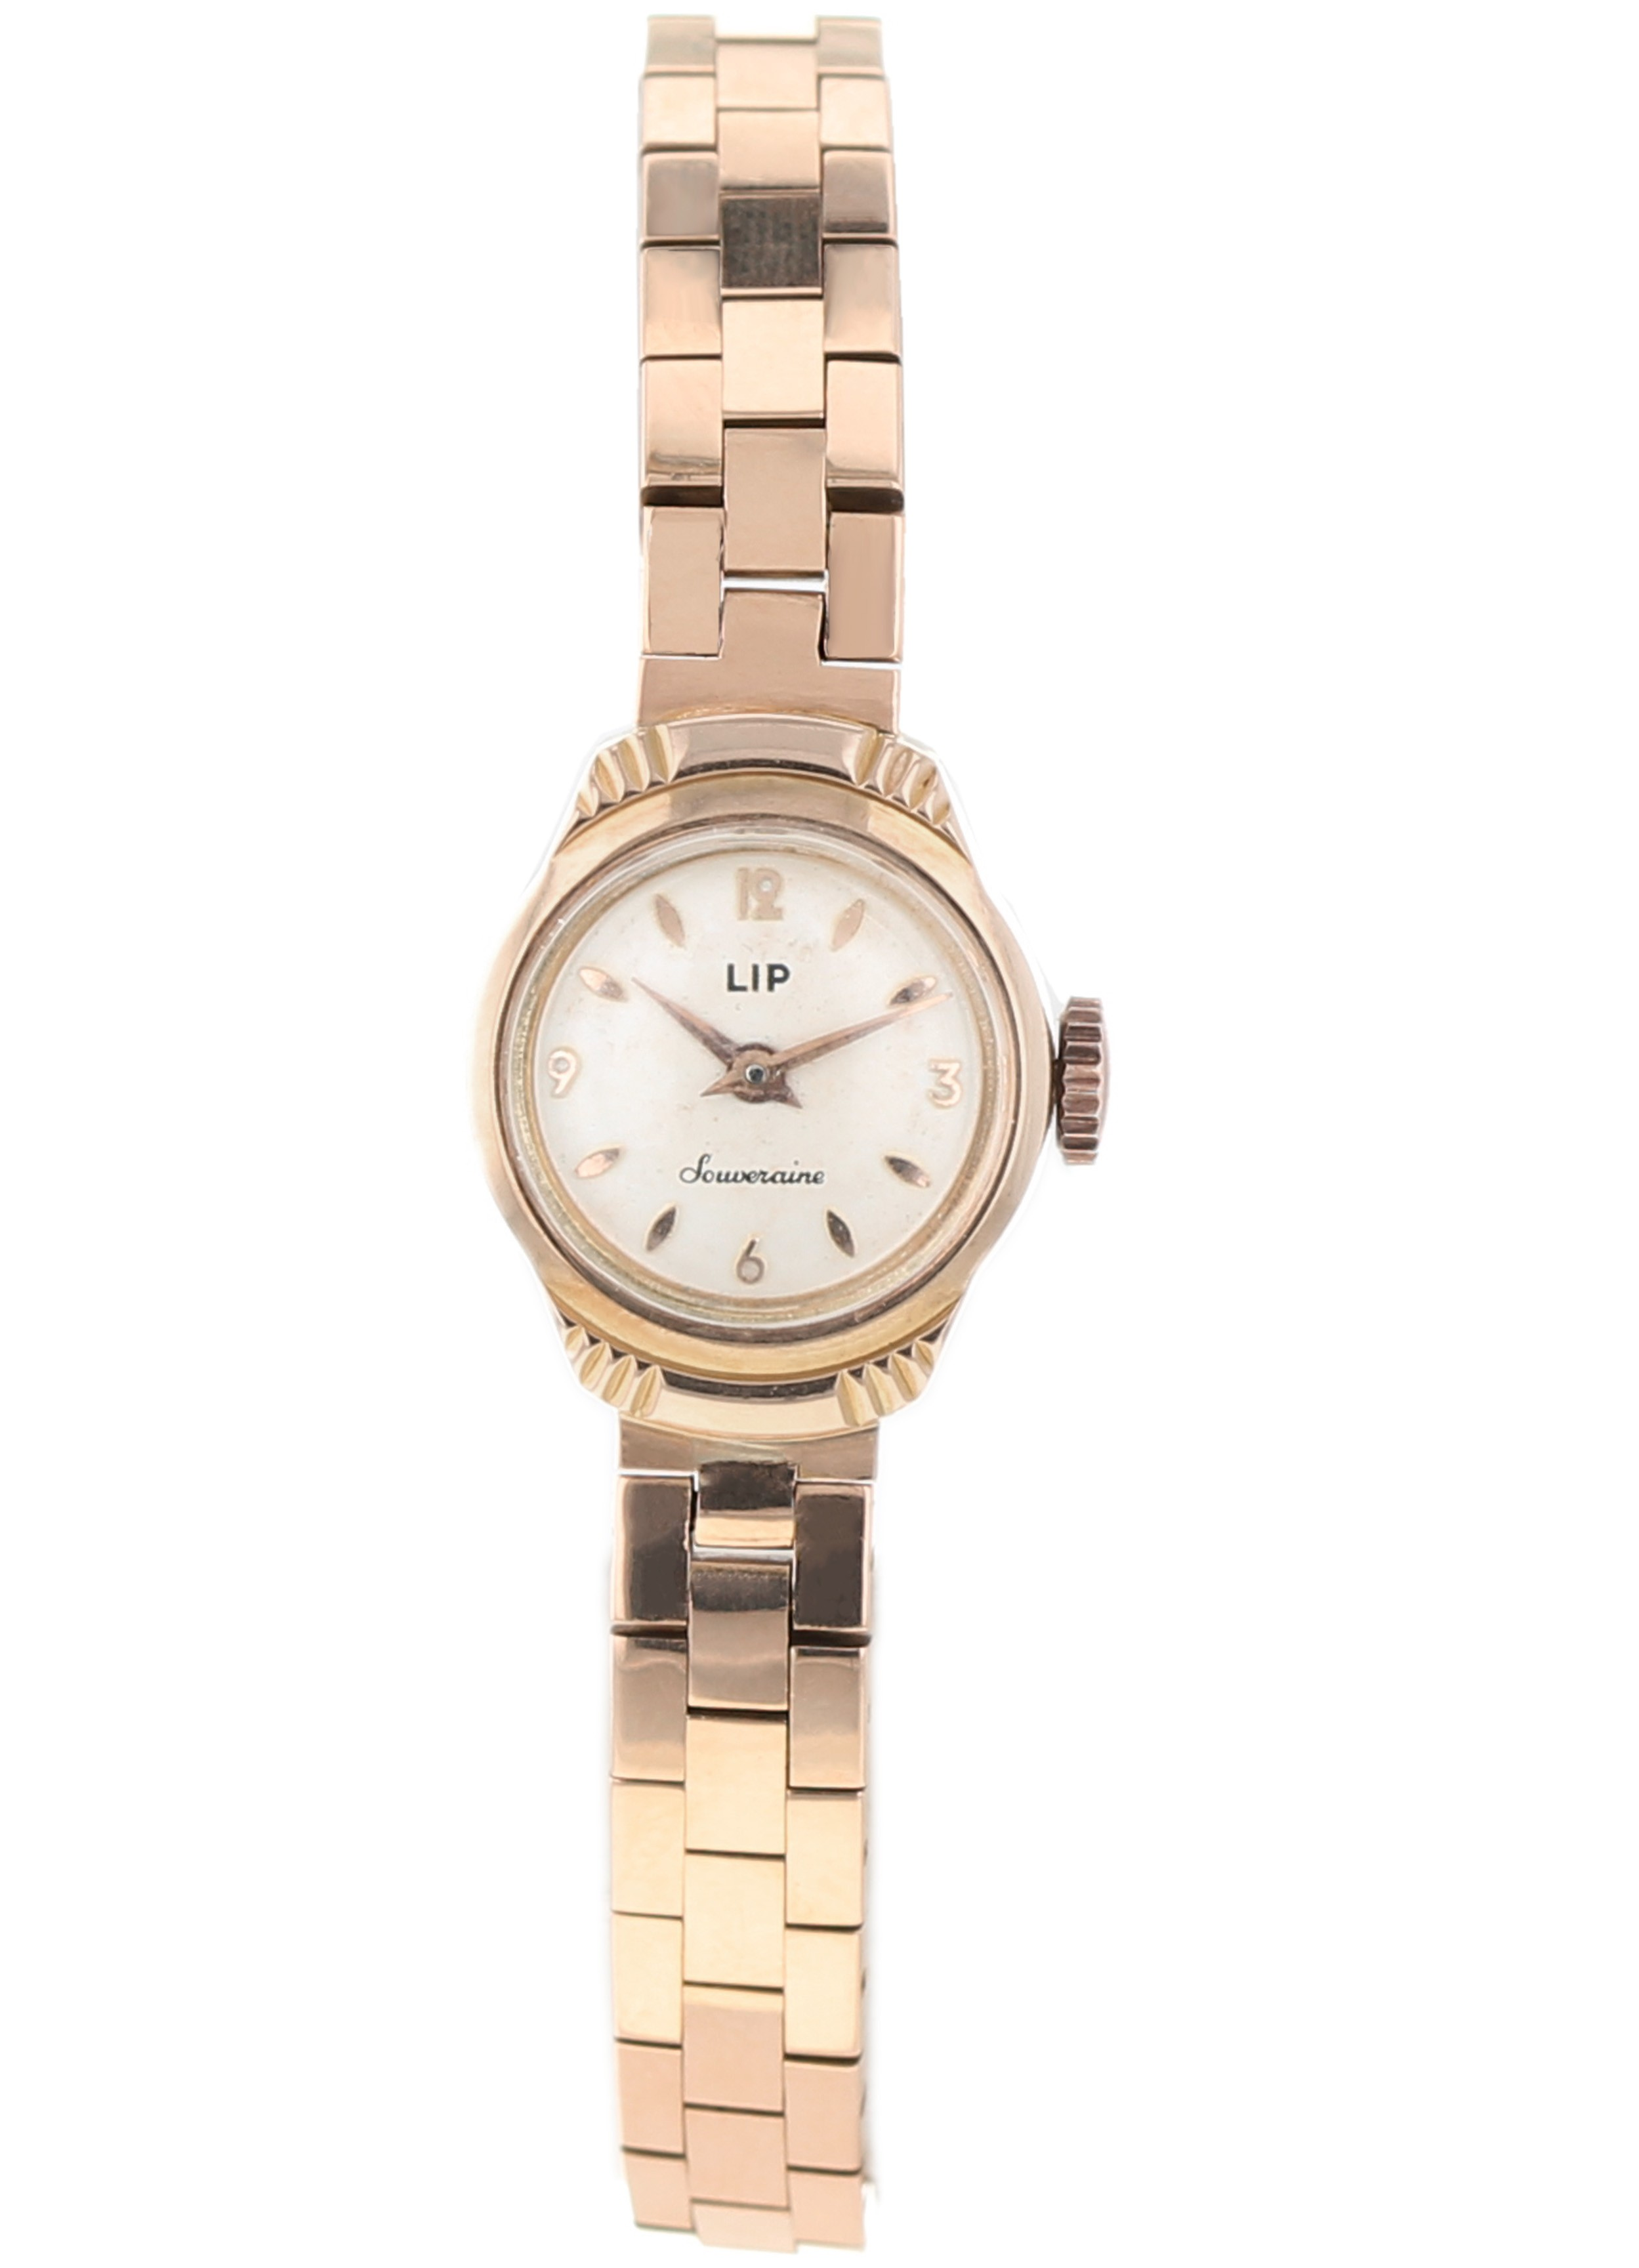 Luxury watch LIP 18k rose vintage souveraine - Kronos 360